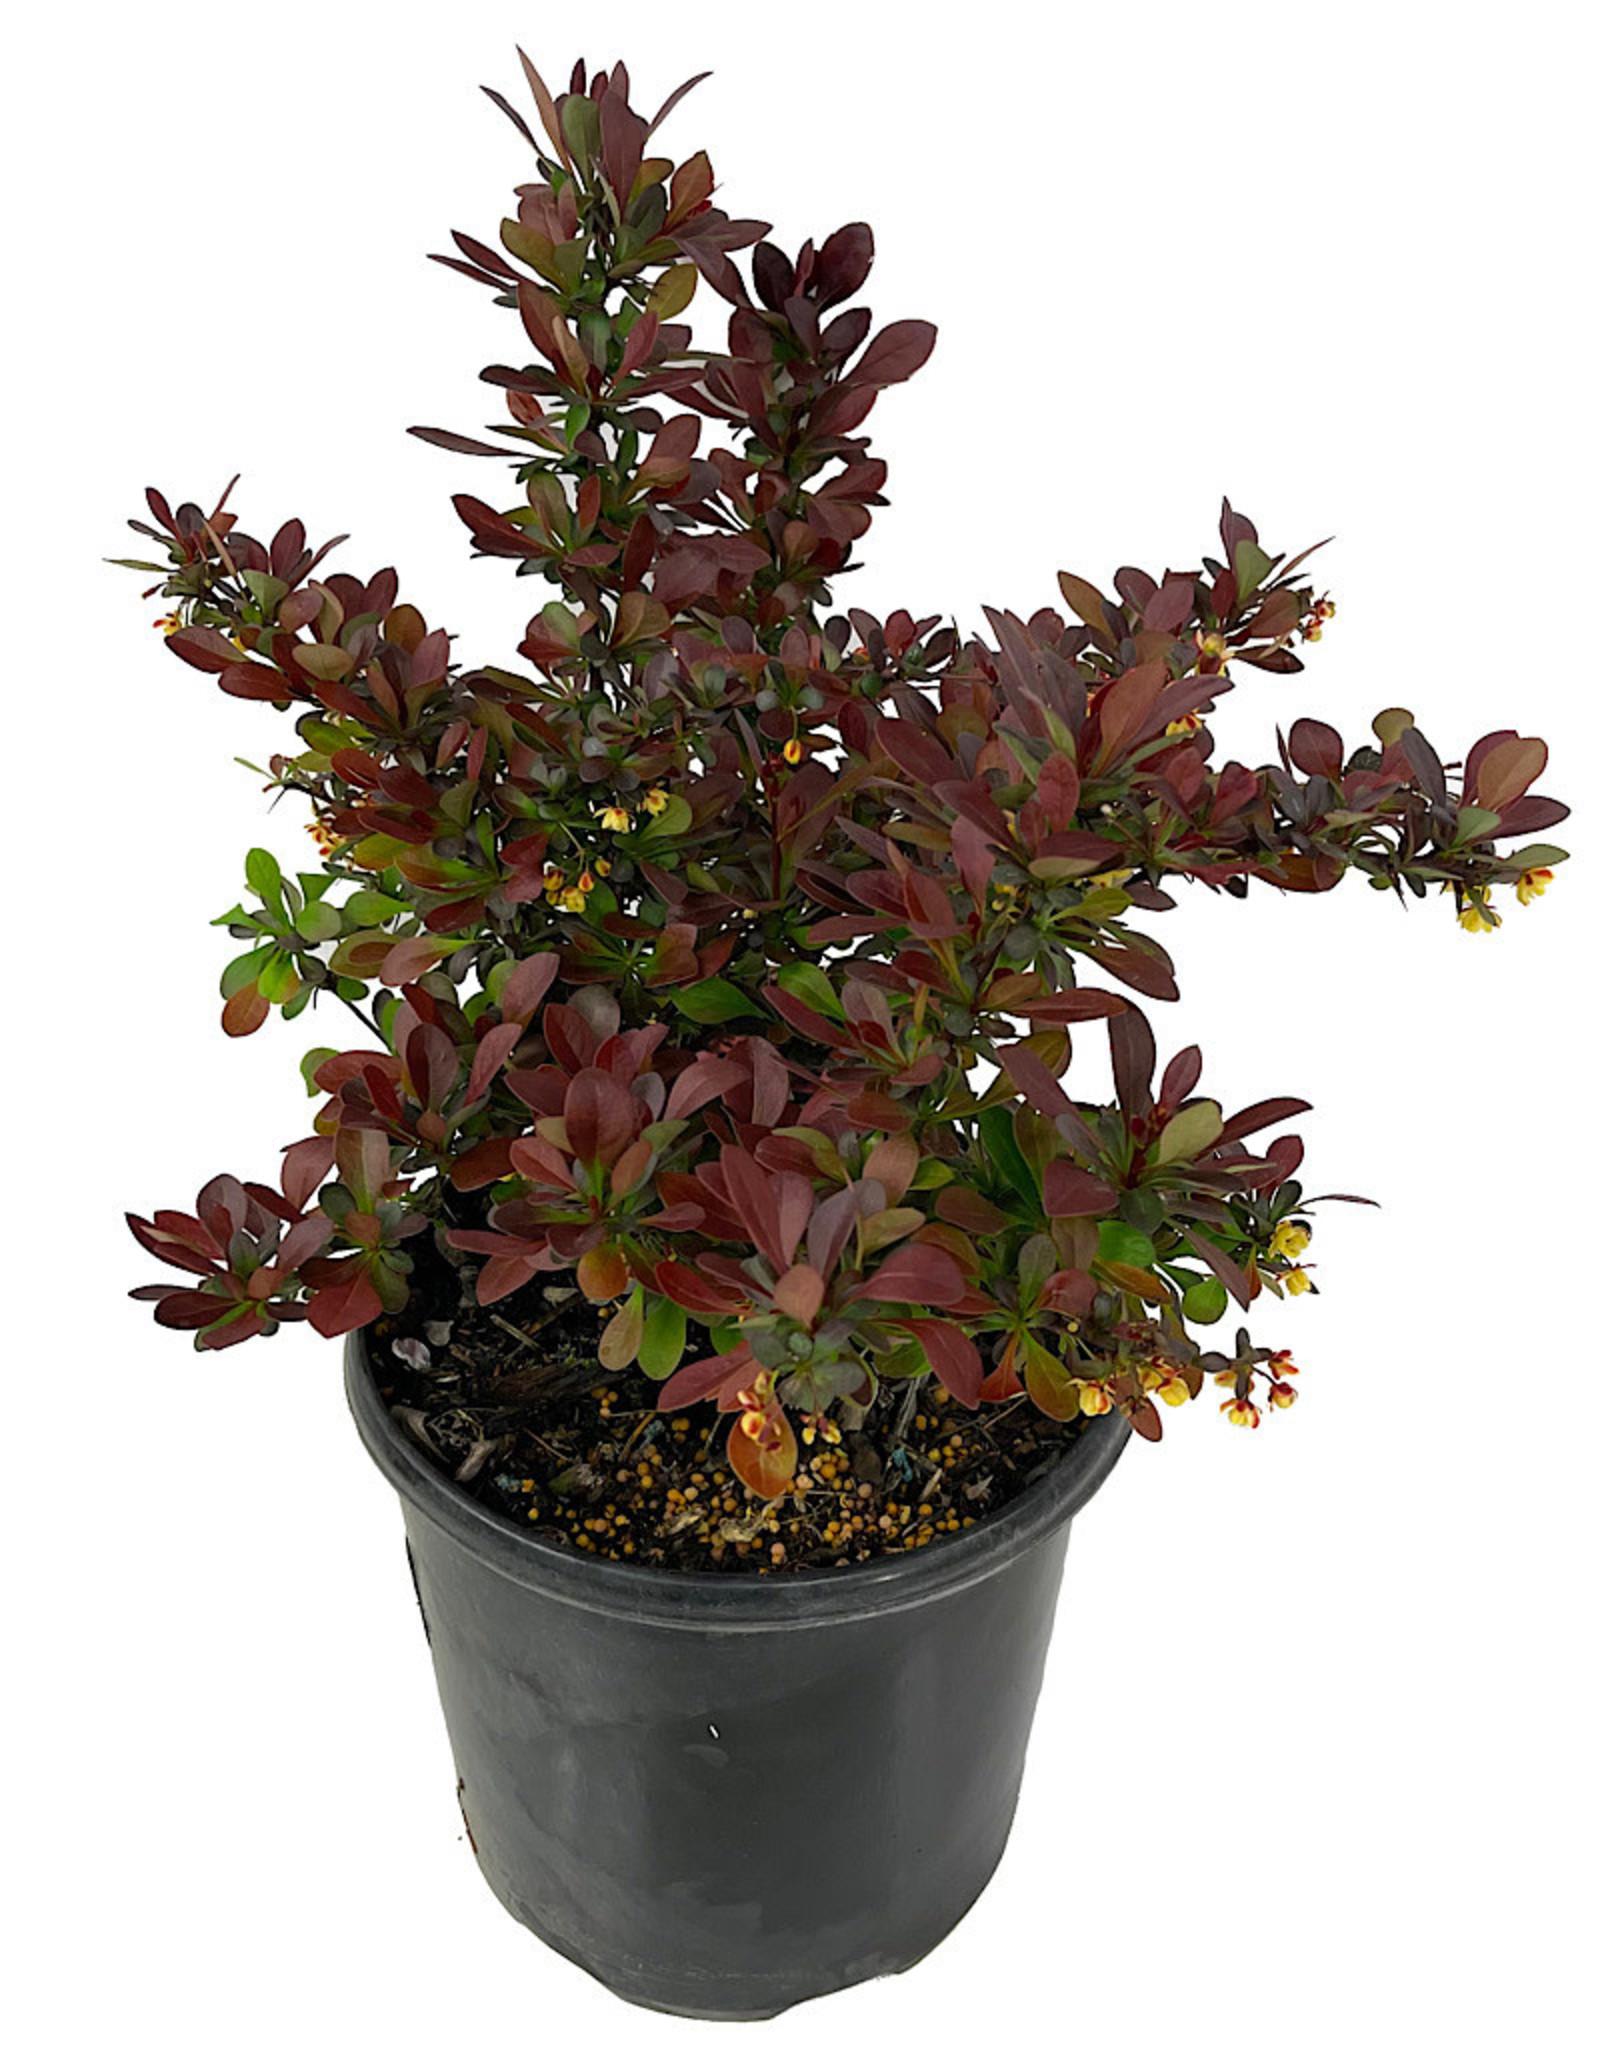 Berberis 'Crimson Pygmy' 1 Gallon